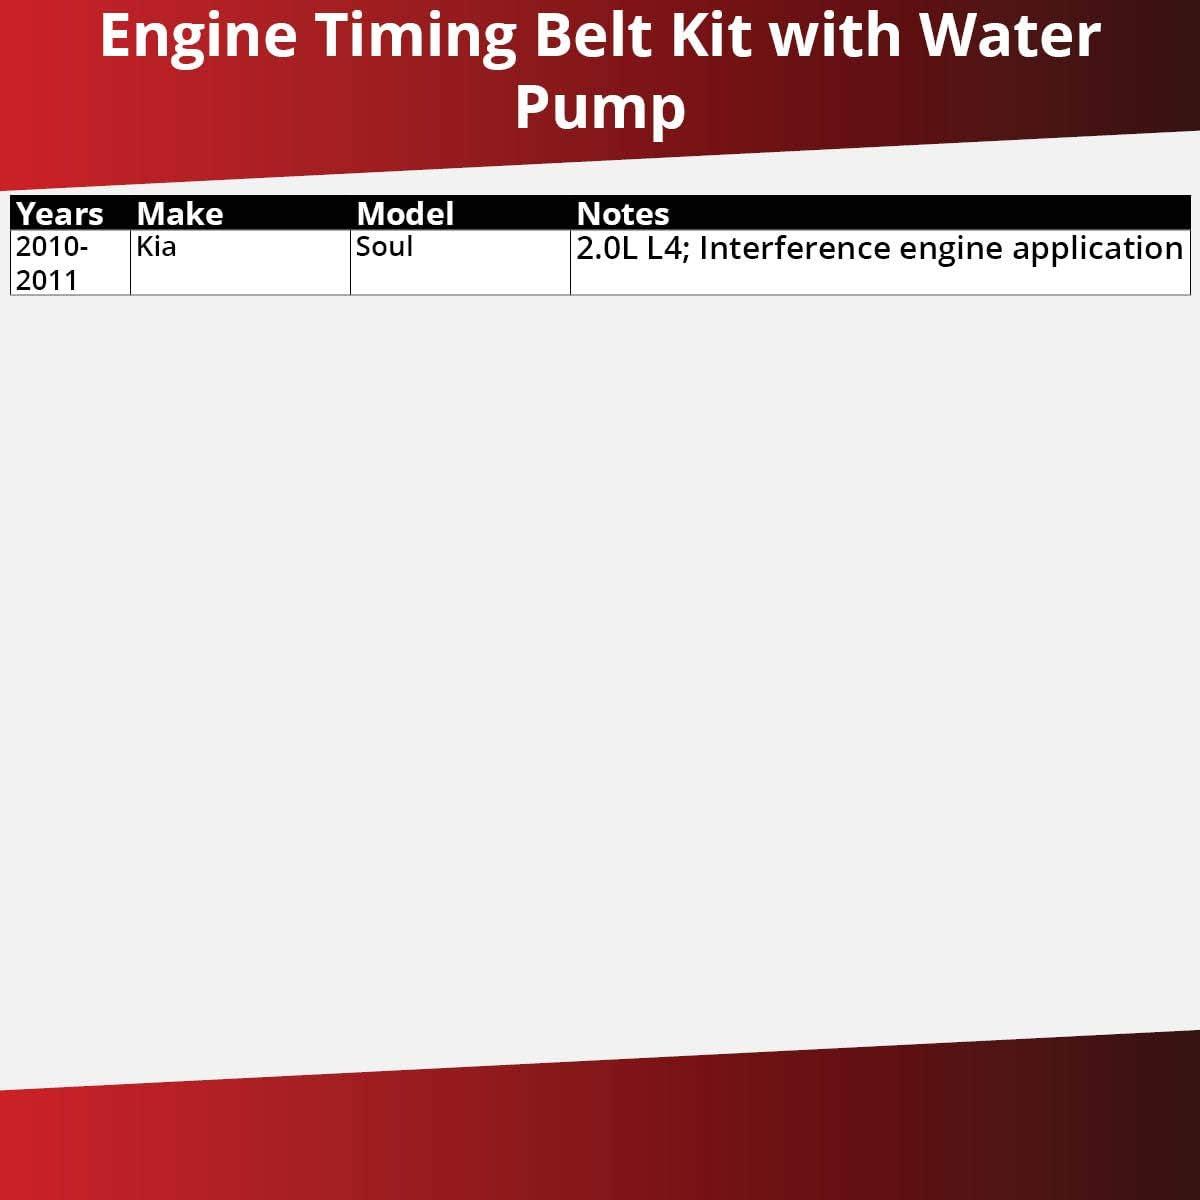 Engine TCKWP OE Upgrade Tensioner Idler Pulley Gates Timing Belt Water Pump Kit for 2010-2011 Kia Soul 2.0L L4